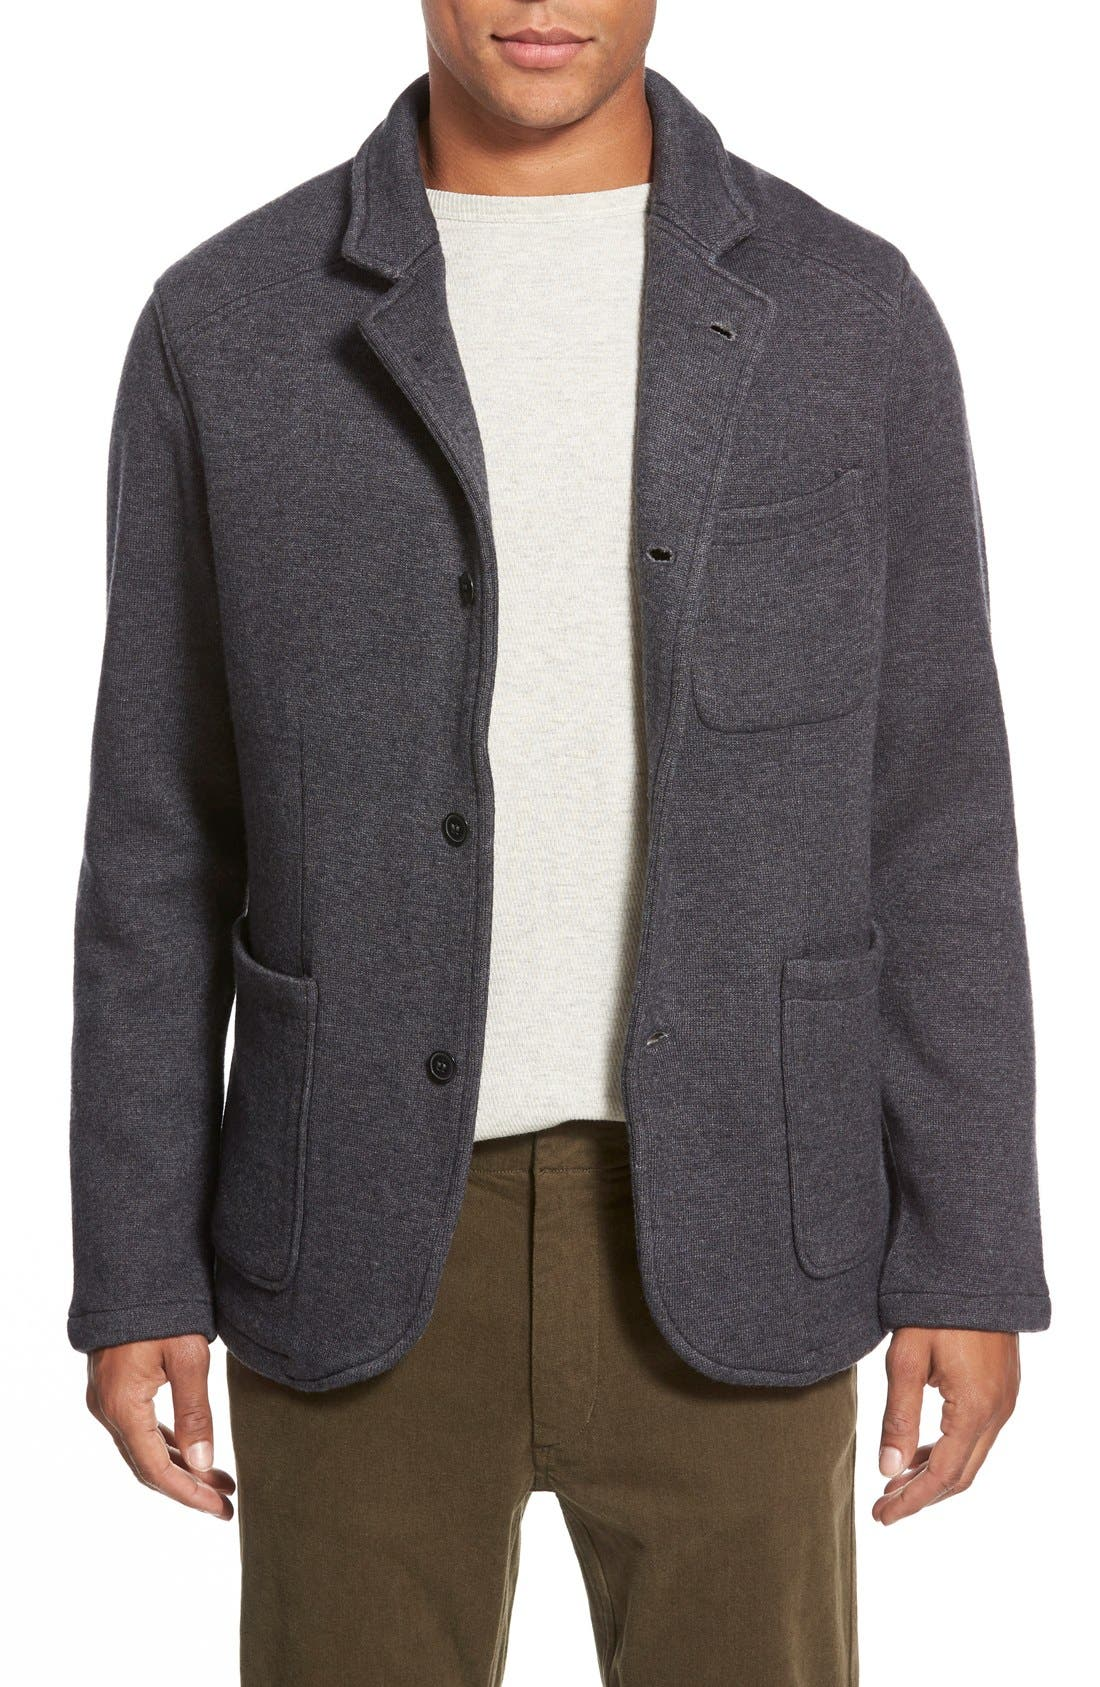 RELWEN Knit Cardigan Blazer, Main, color, 021